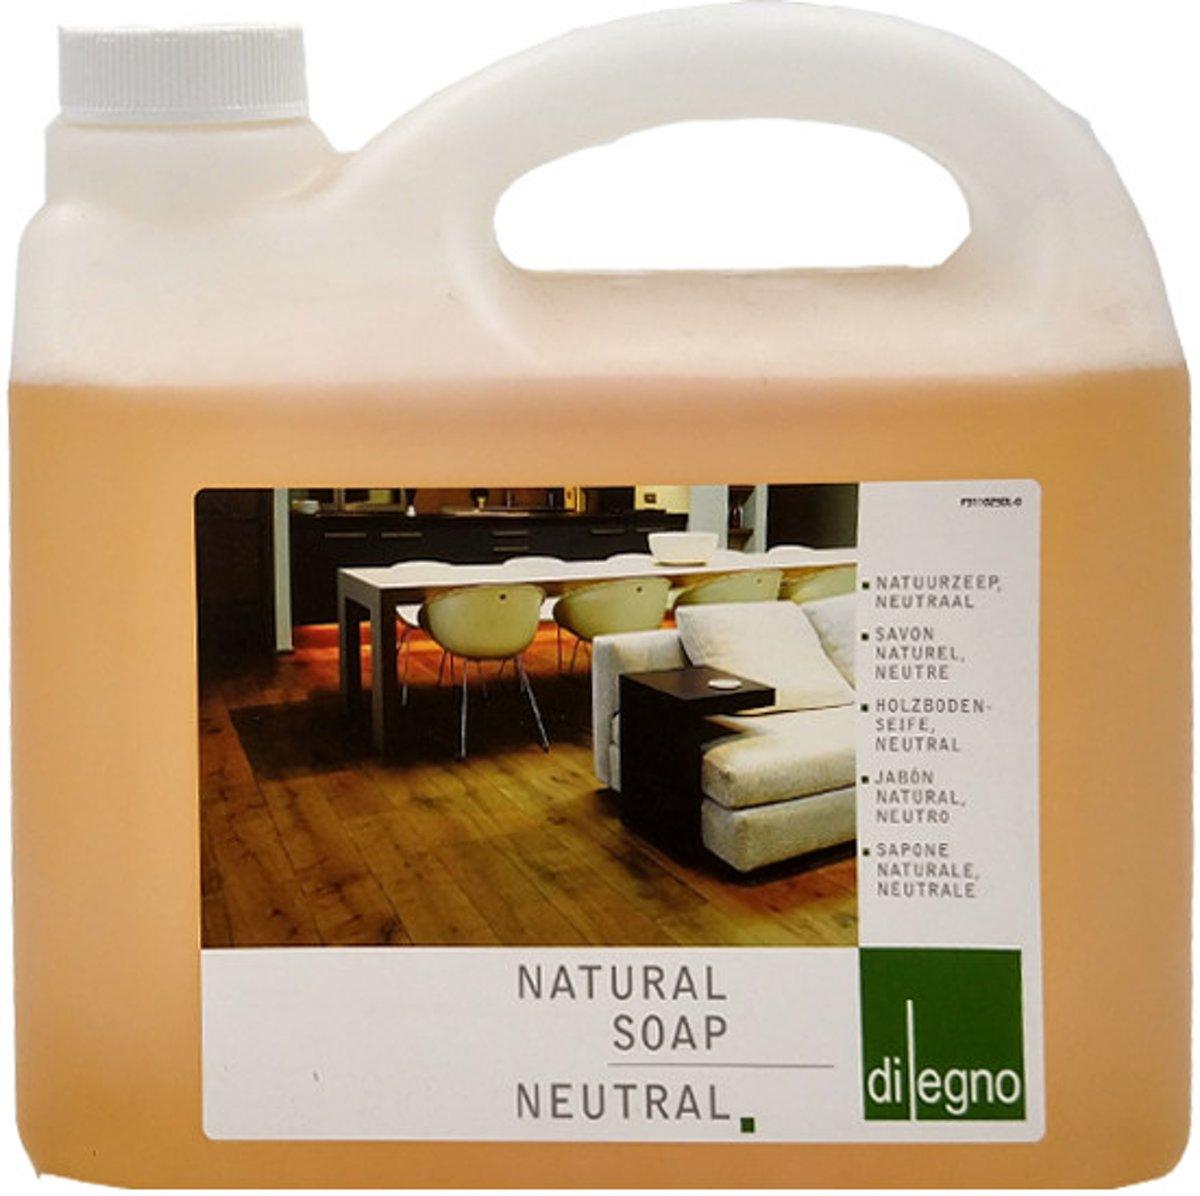 Di Legno Natural Soap Neutral 2,5L MD012 kopen